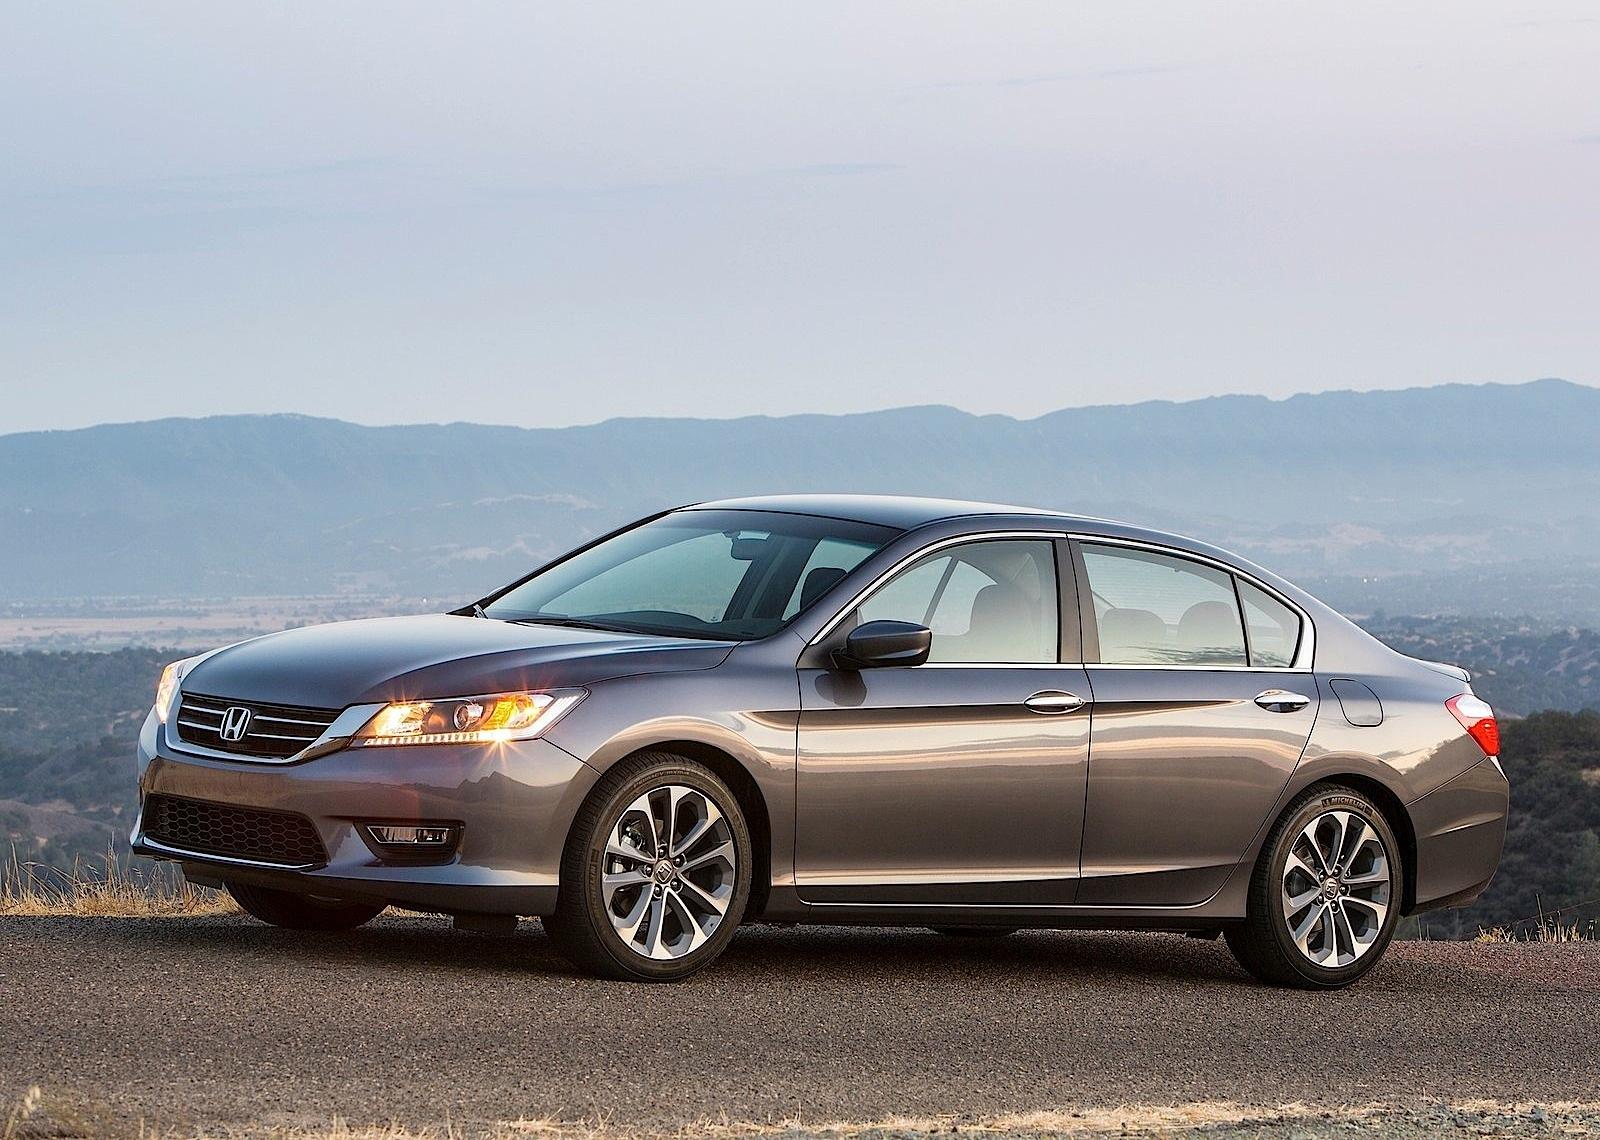 Honda Accord 2019 Exterior Side View